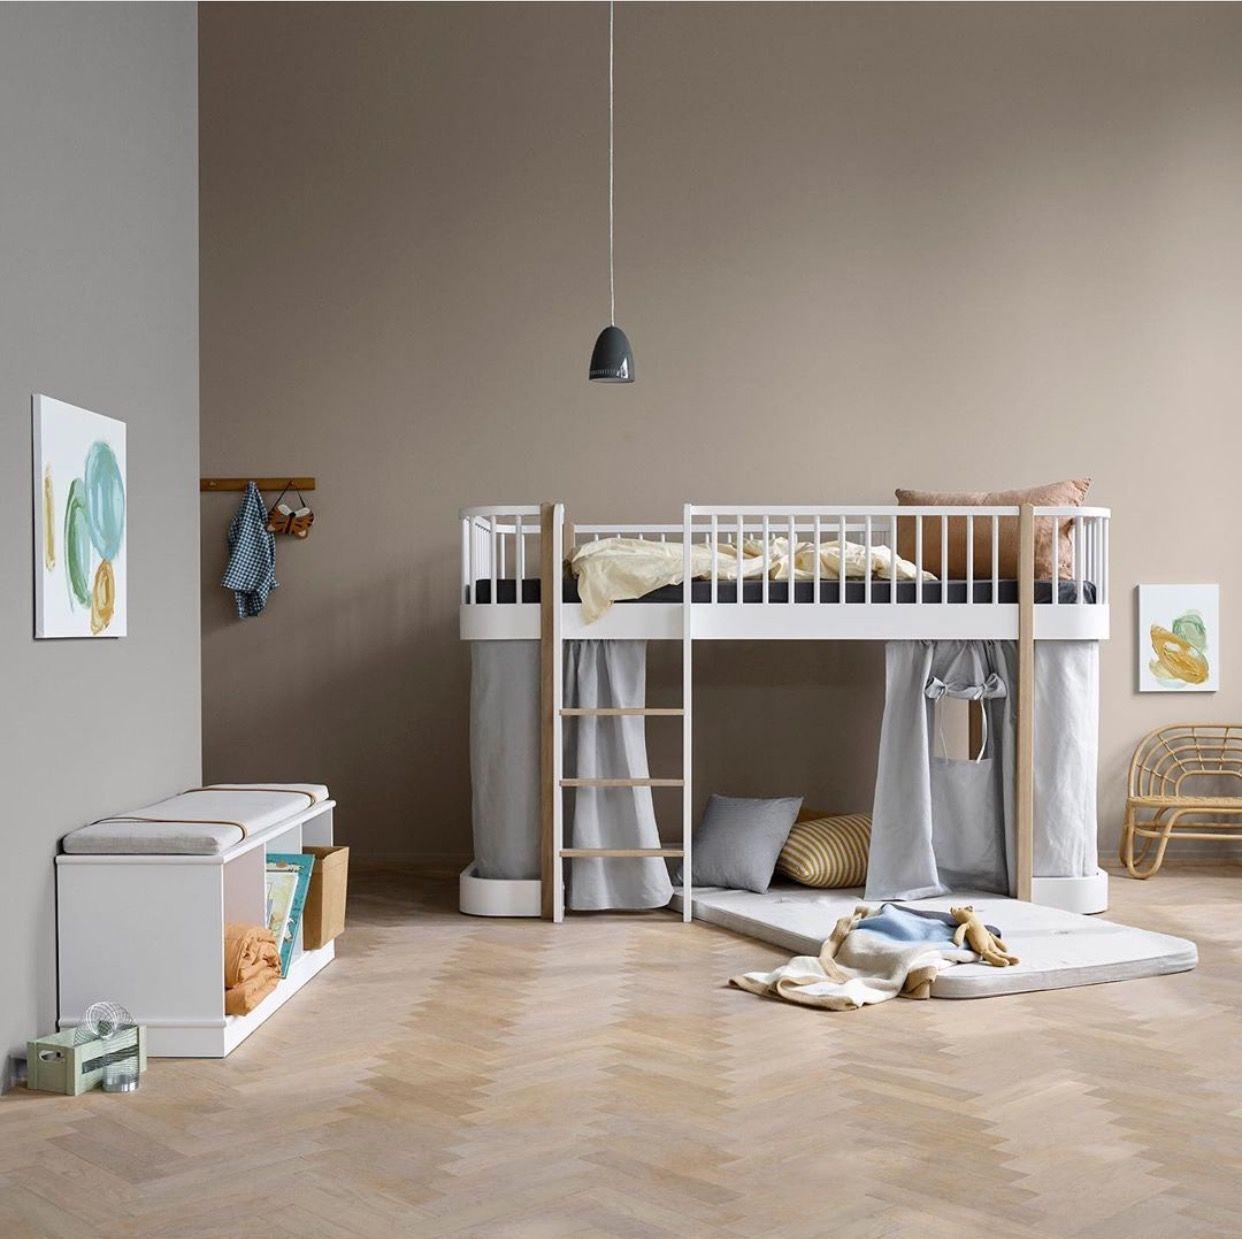 Oliver Furniture Wood Low Loft Bed in 2020 Low loft beds